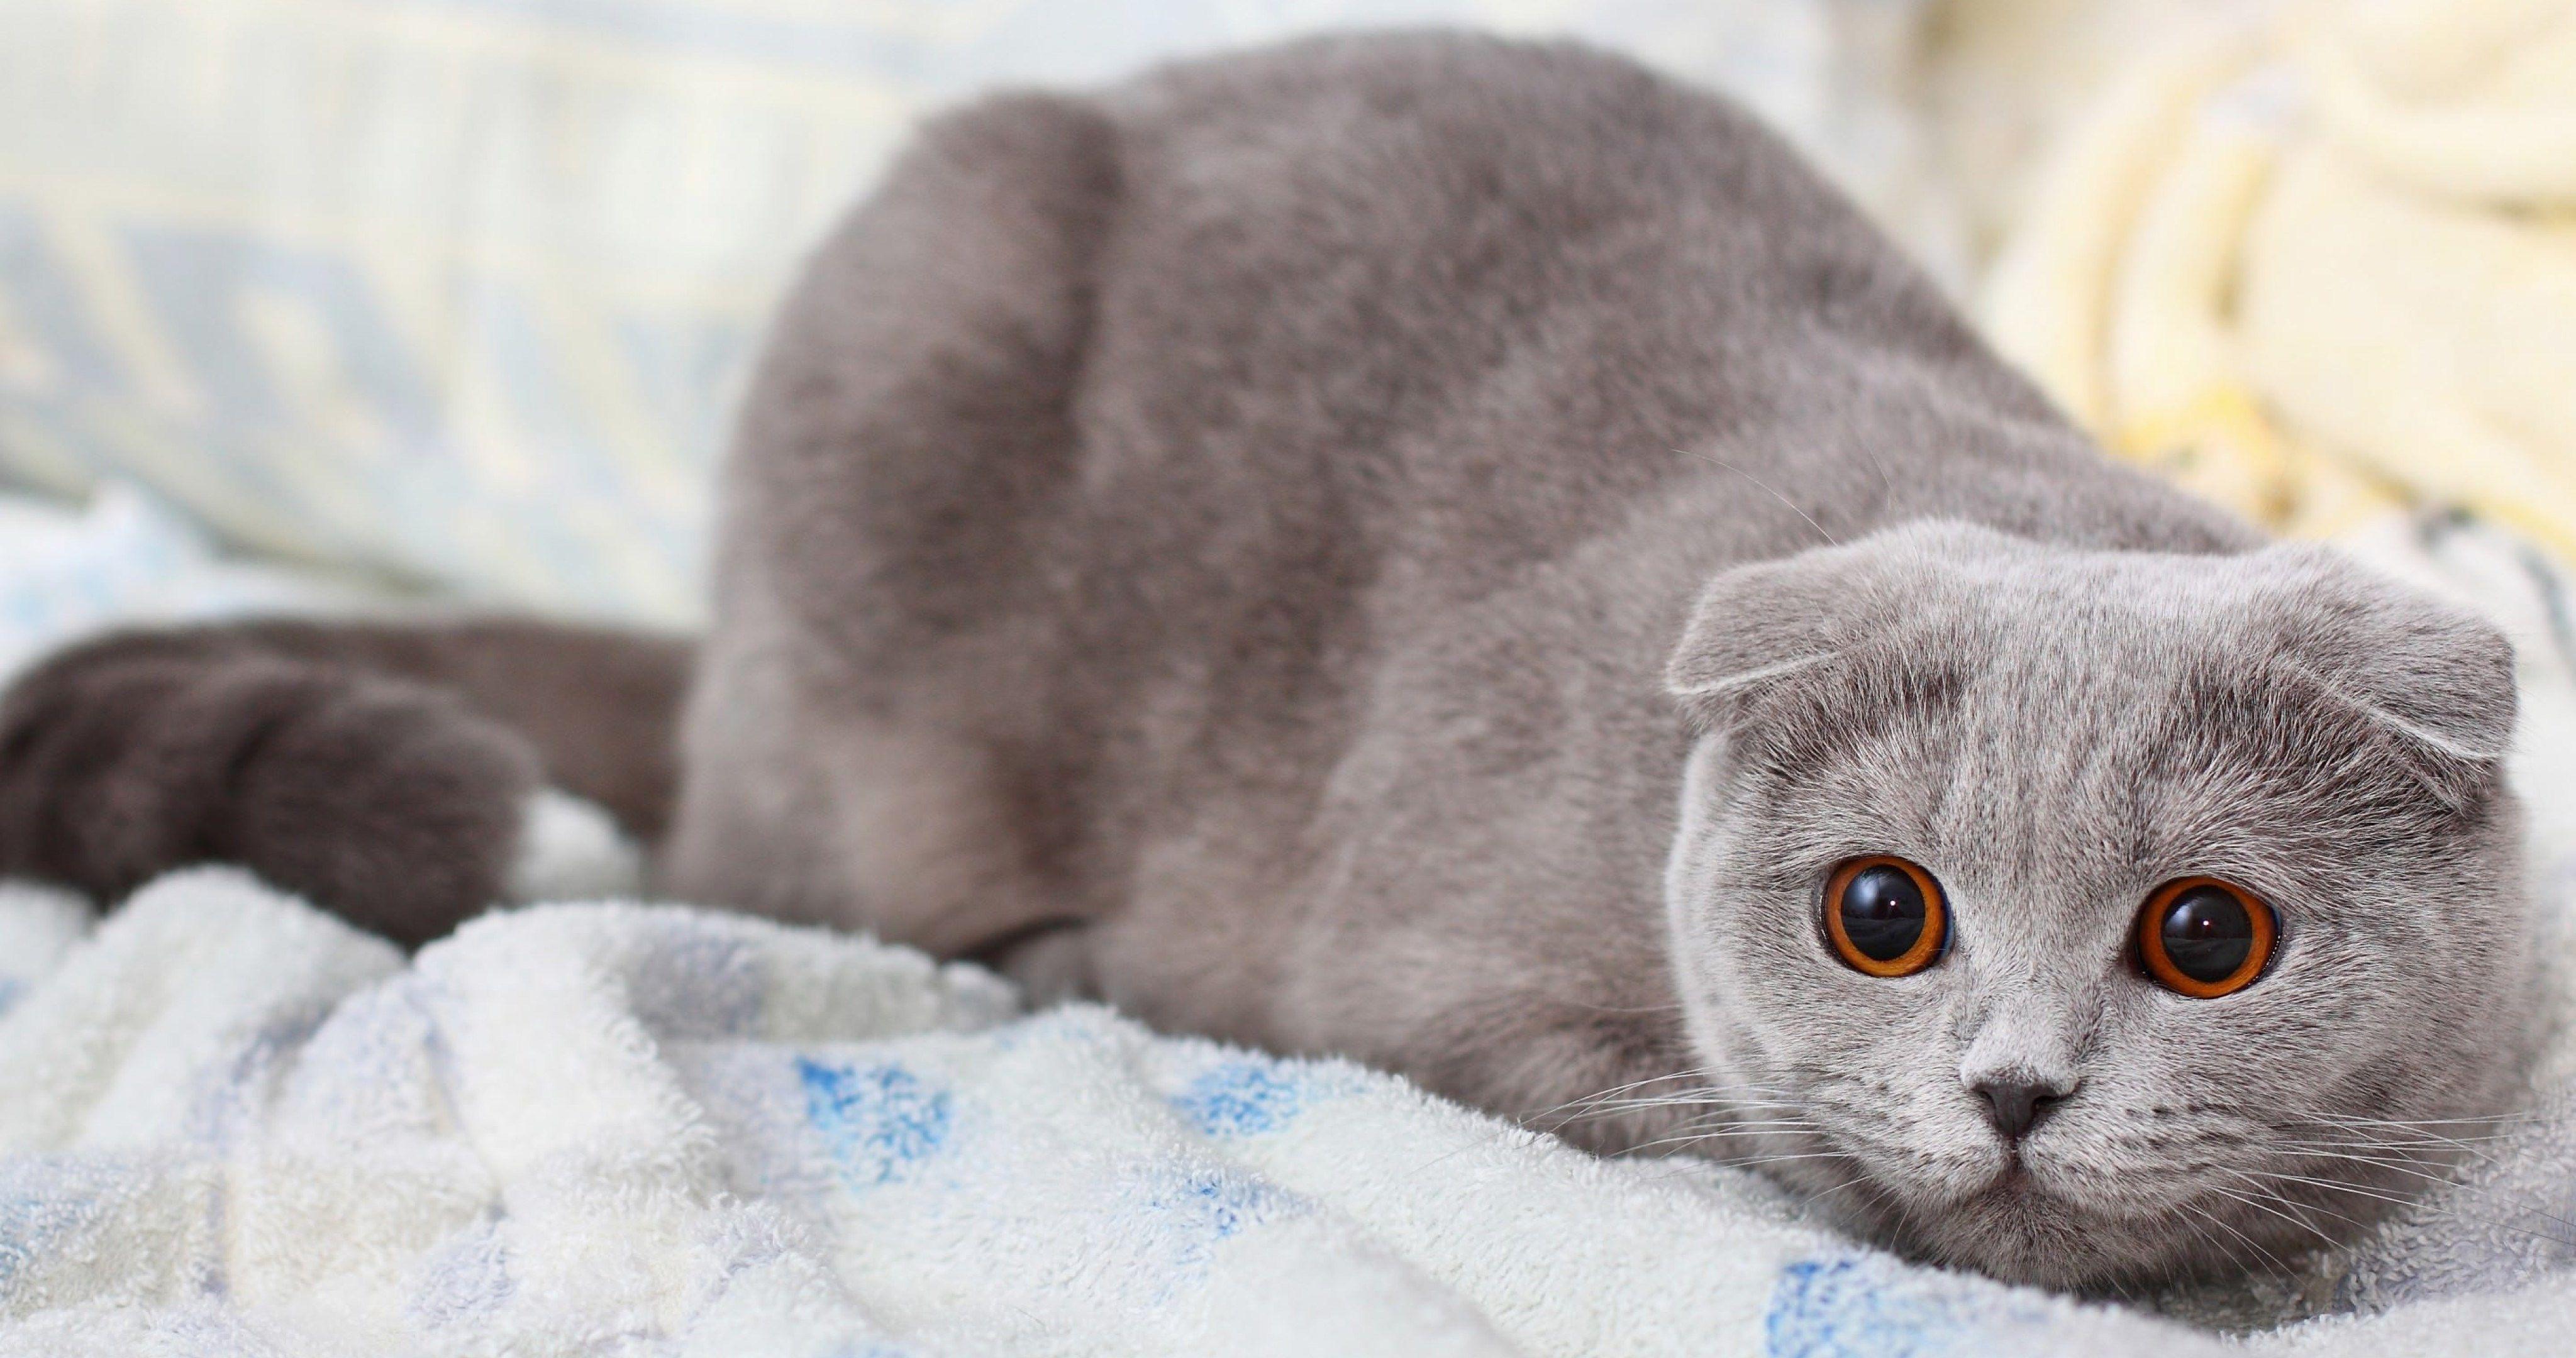 Cat Scottish Fold 4k Ultra Hd Wallpaper Cat Wallpaper Cat